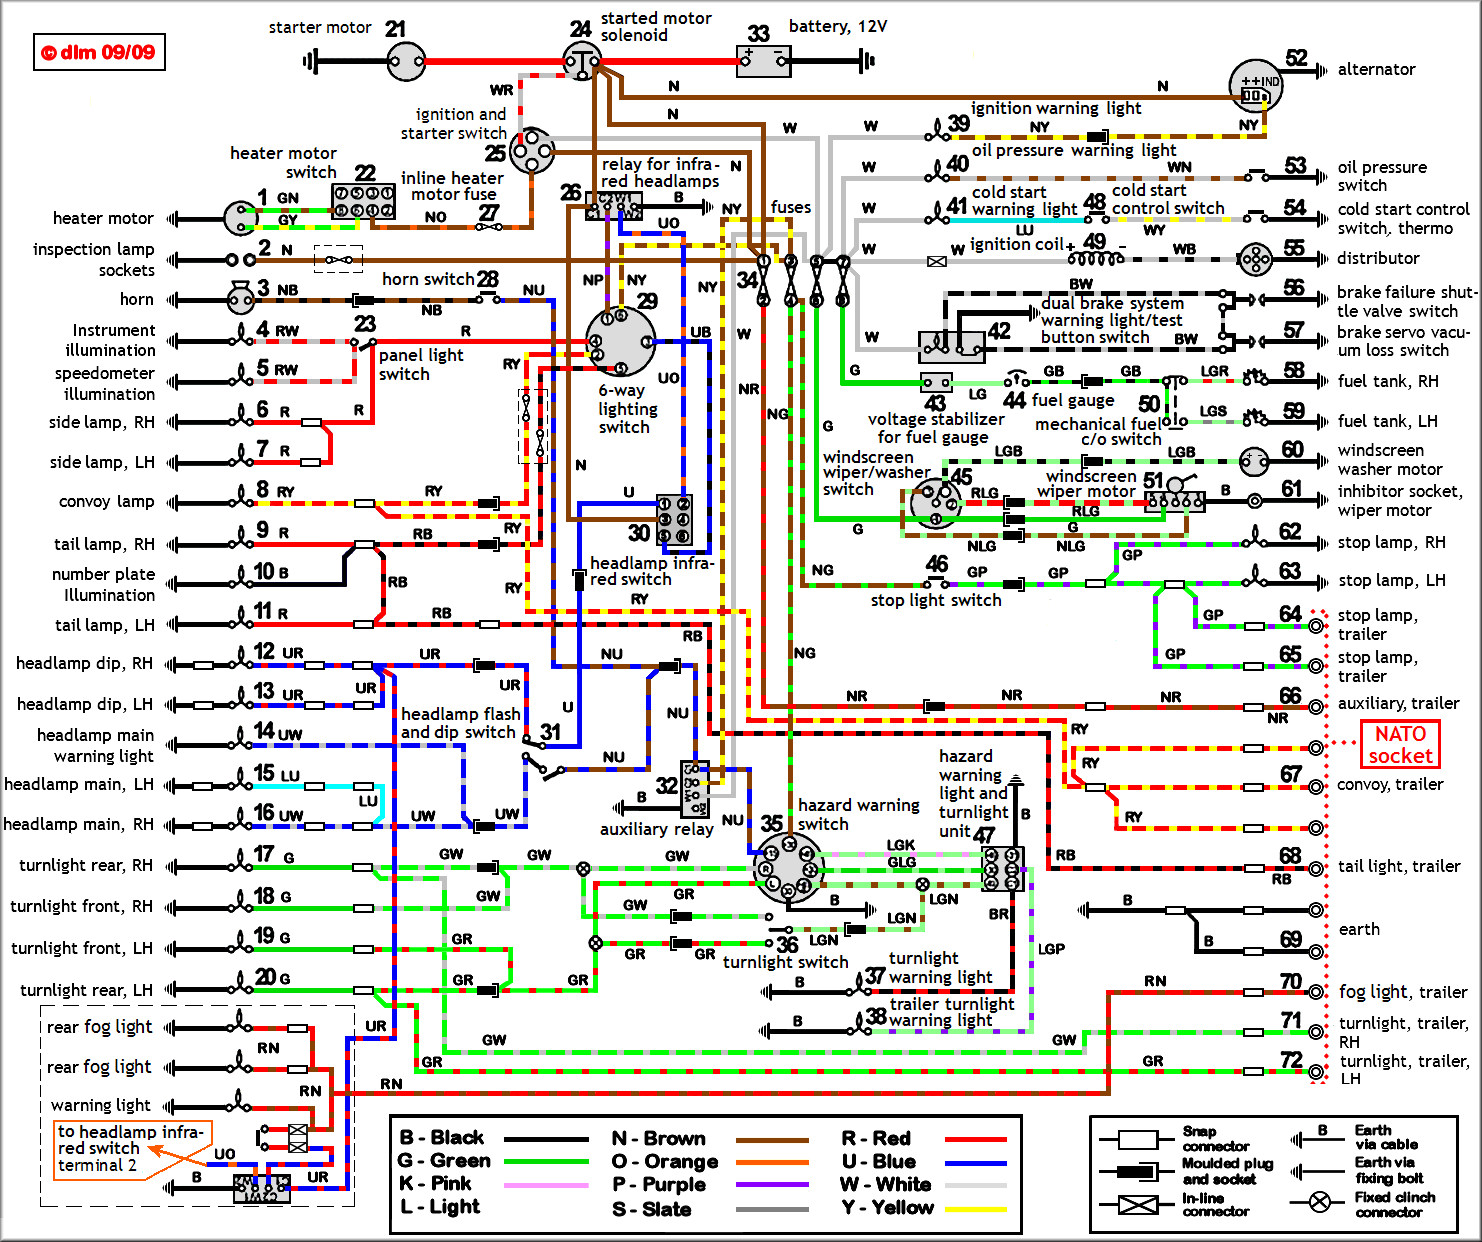 terminal block wire diagram colors wiring diagram rh cleanprosperity co 7-Way Trailer Wiring Harness Diagram Toyota Wiring Harness Diagram